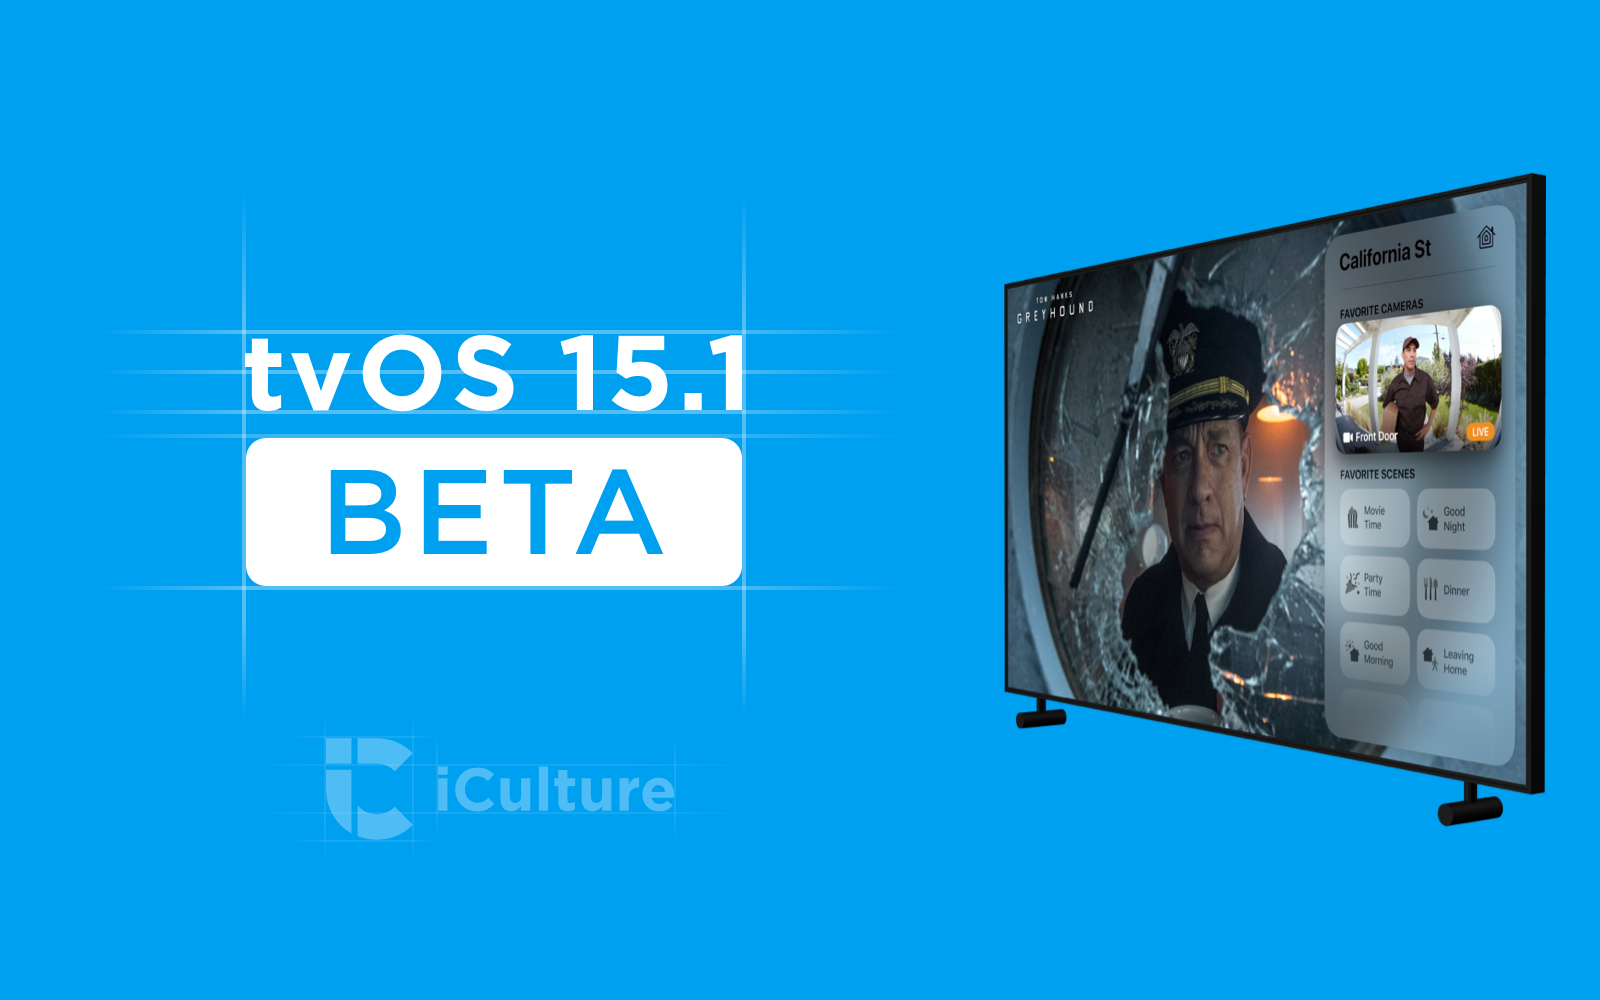 tvOS 15.1 beta.